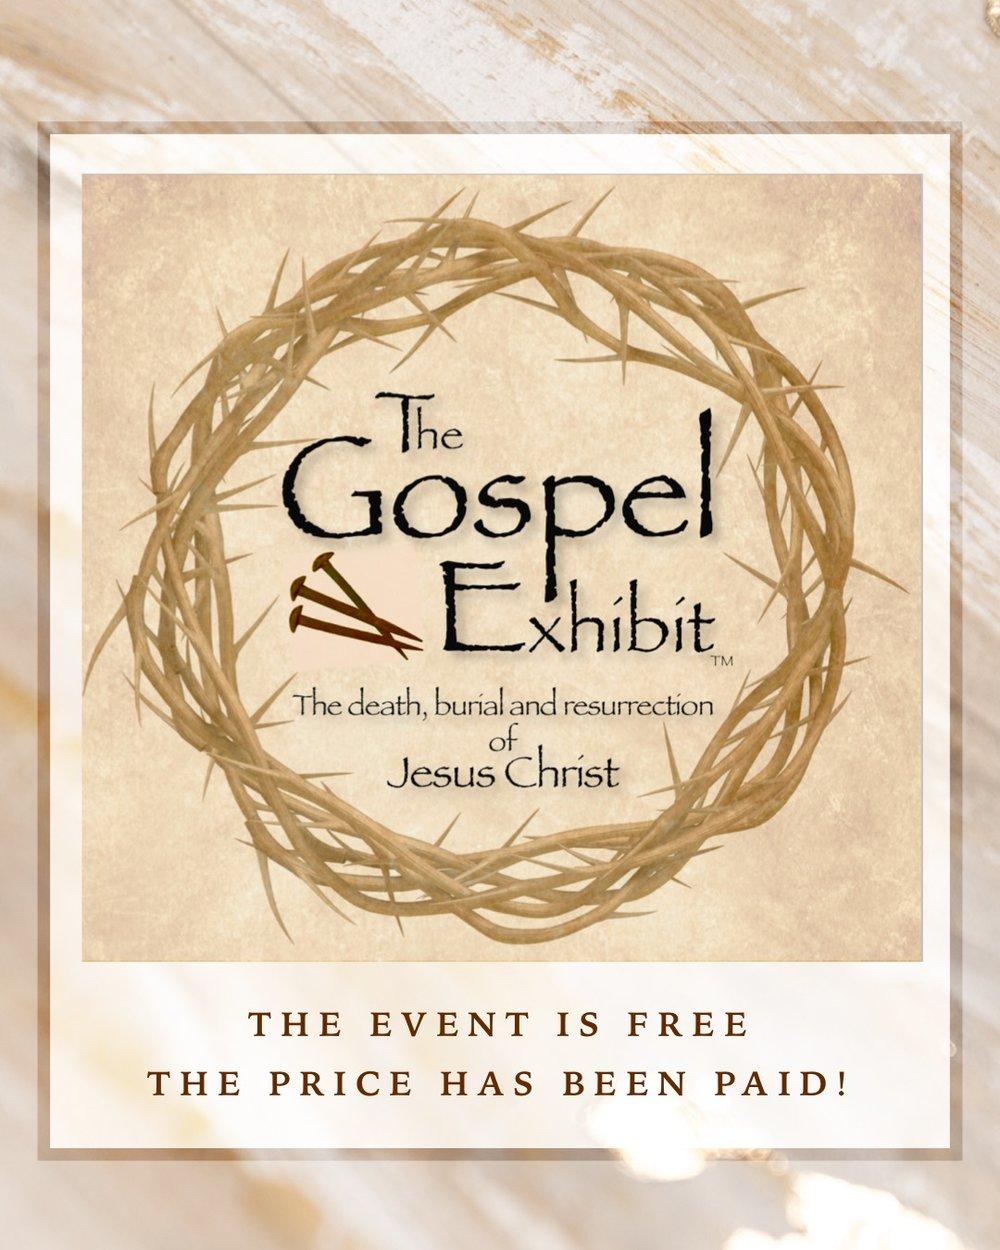 The Gospel Exhibit - The Price Has Been Paid